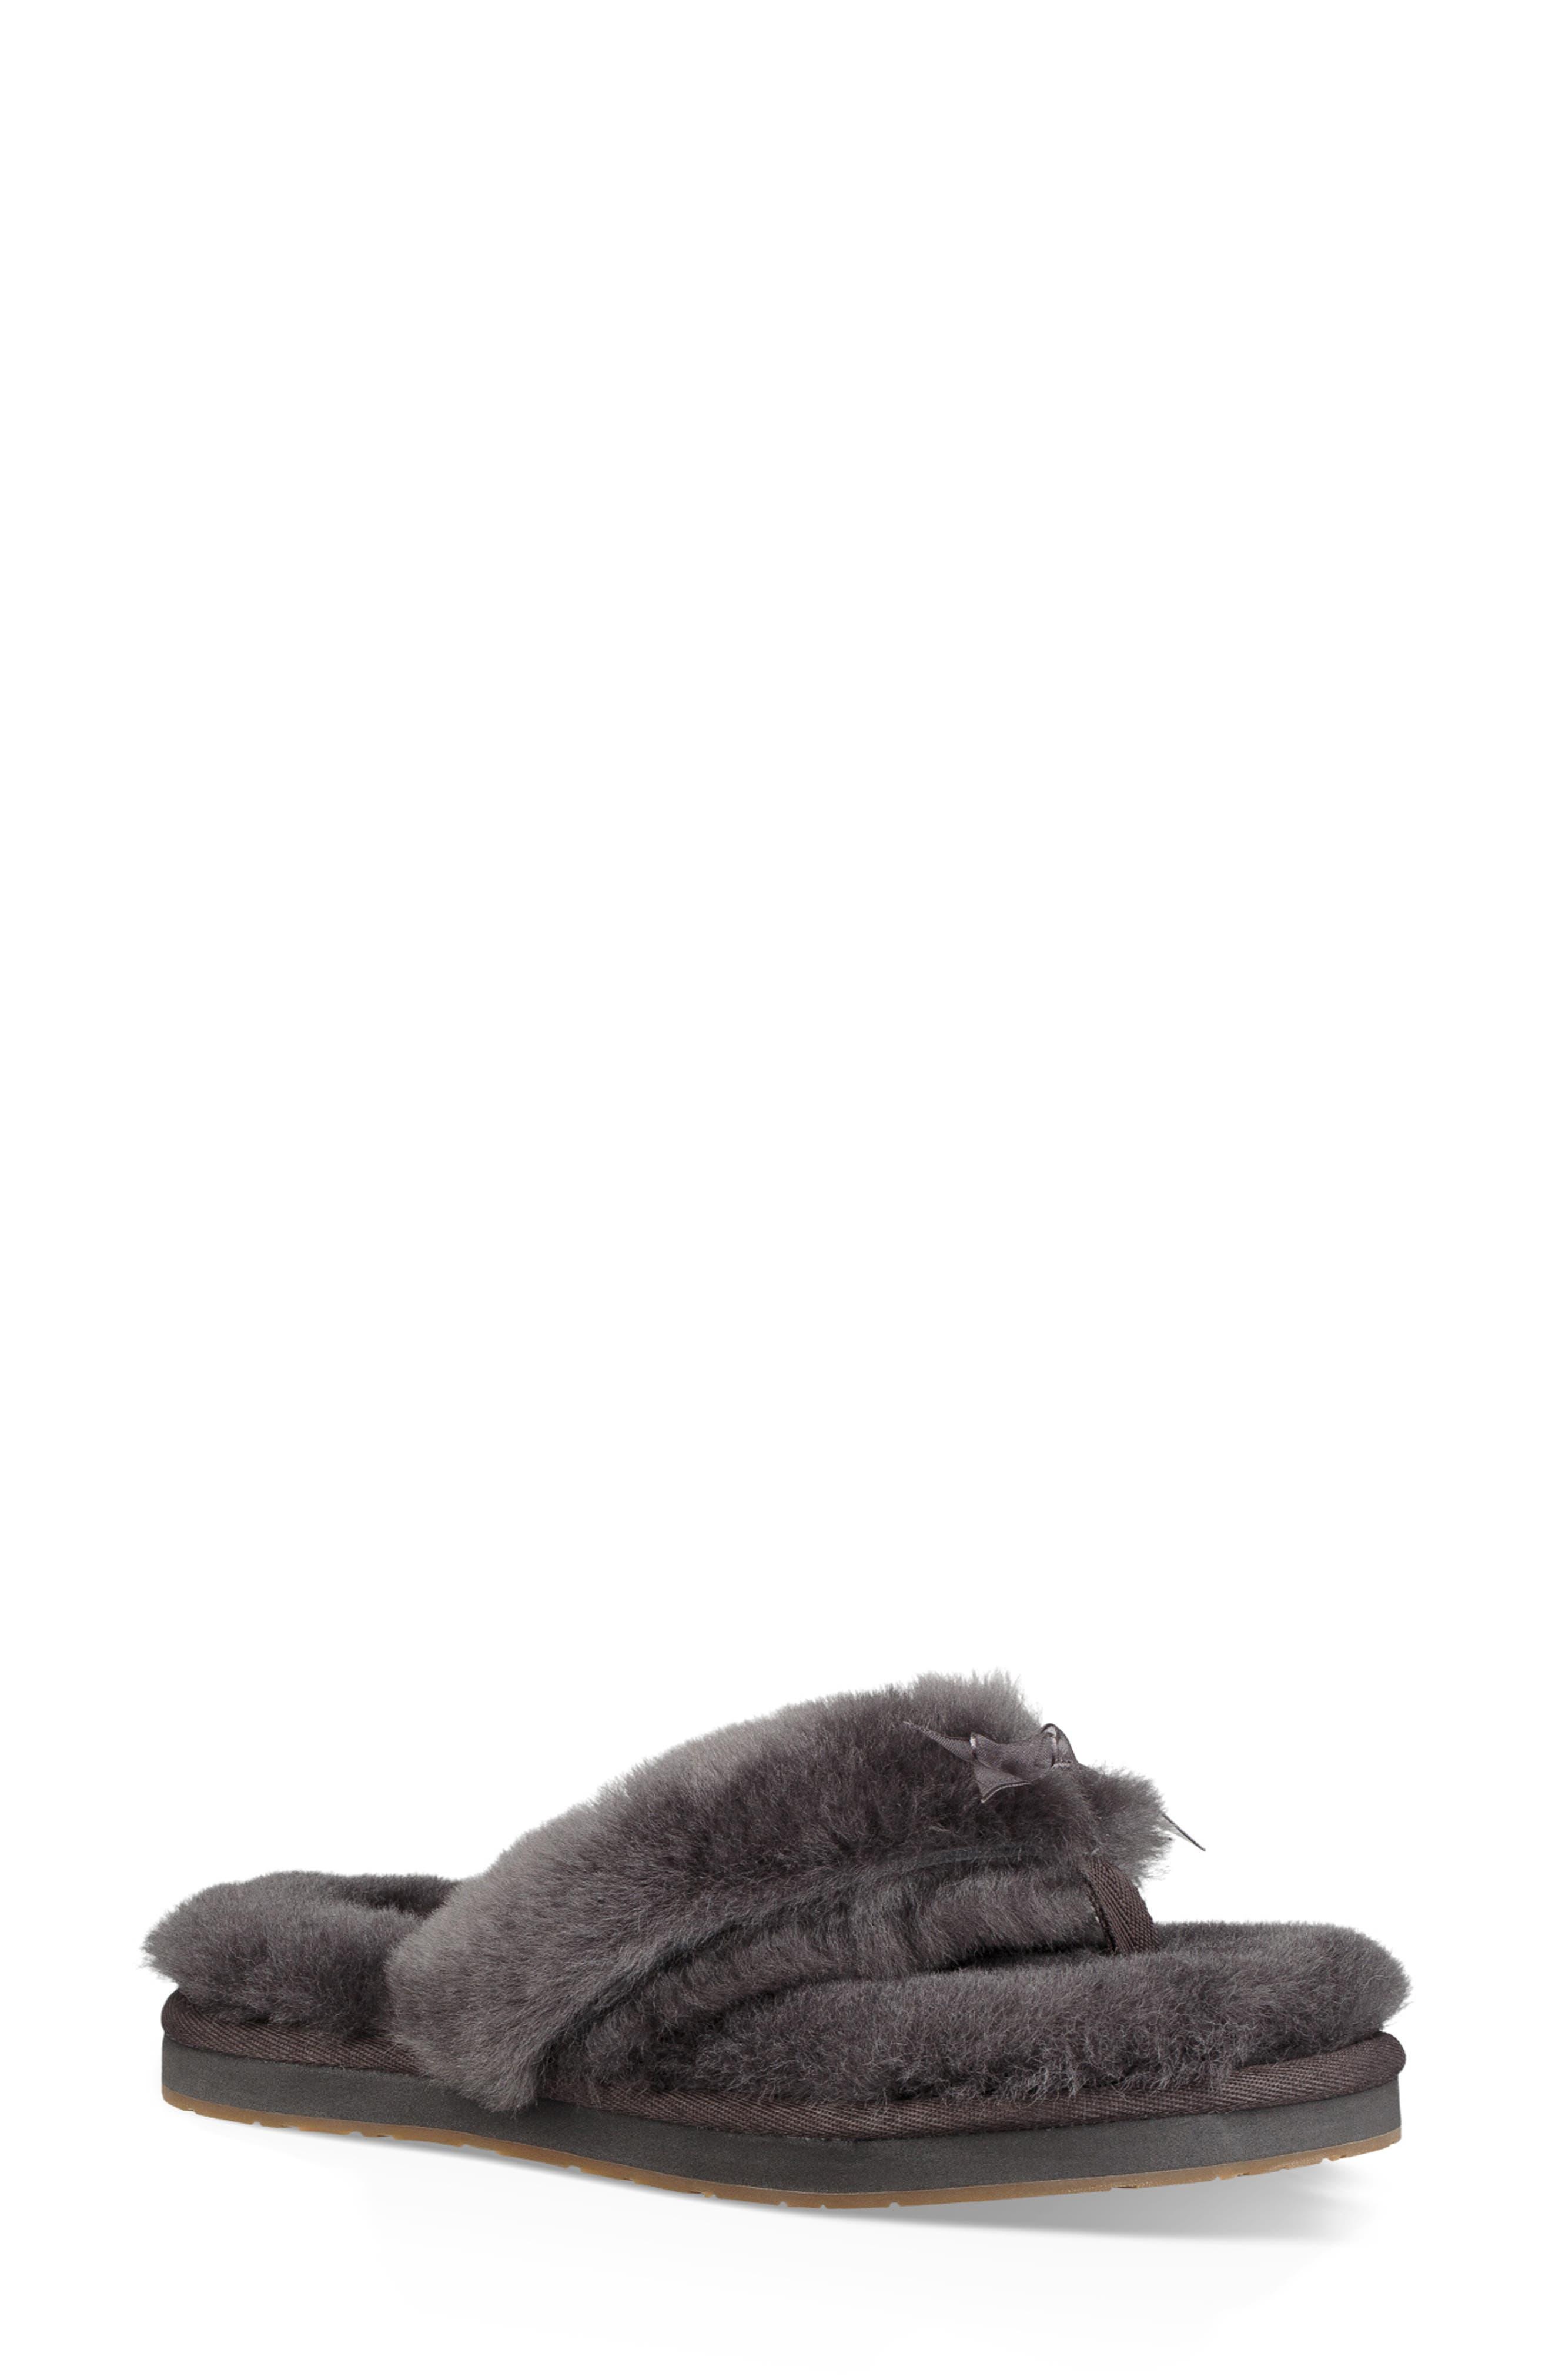 86b18ff348d Ugg Slippers - Women s - Shearling   Sheepskin Slippers